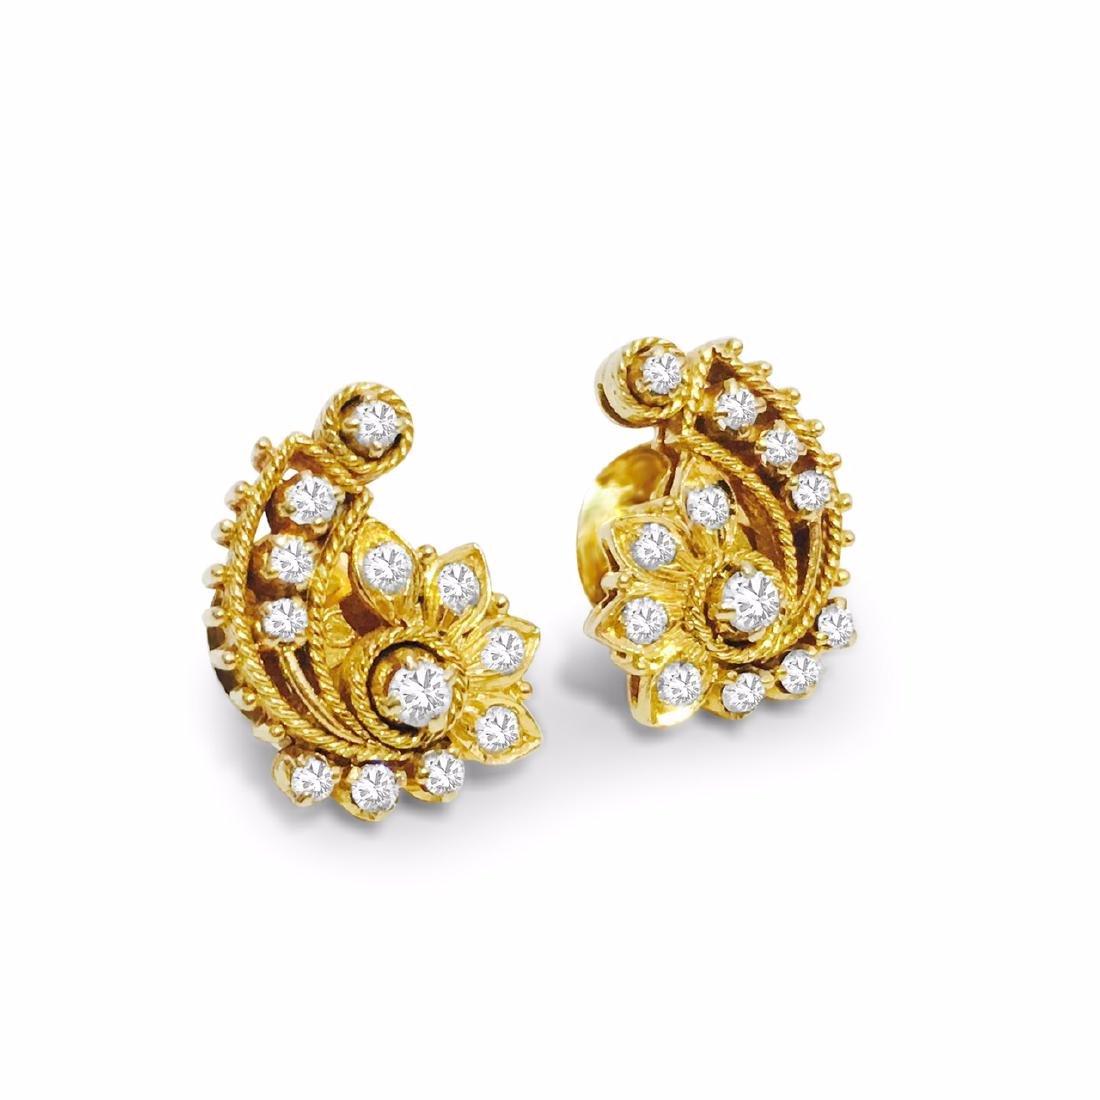 18K Yellow Gold 1 carat vintage Diamond Earrings. - 3